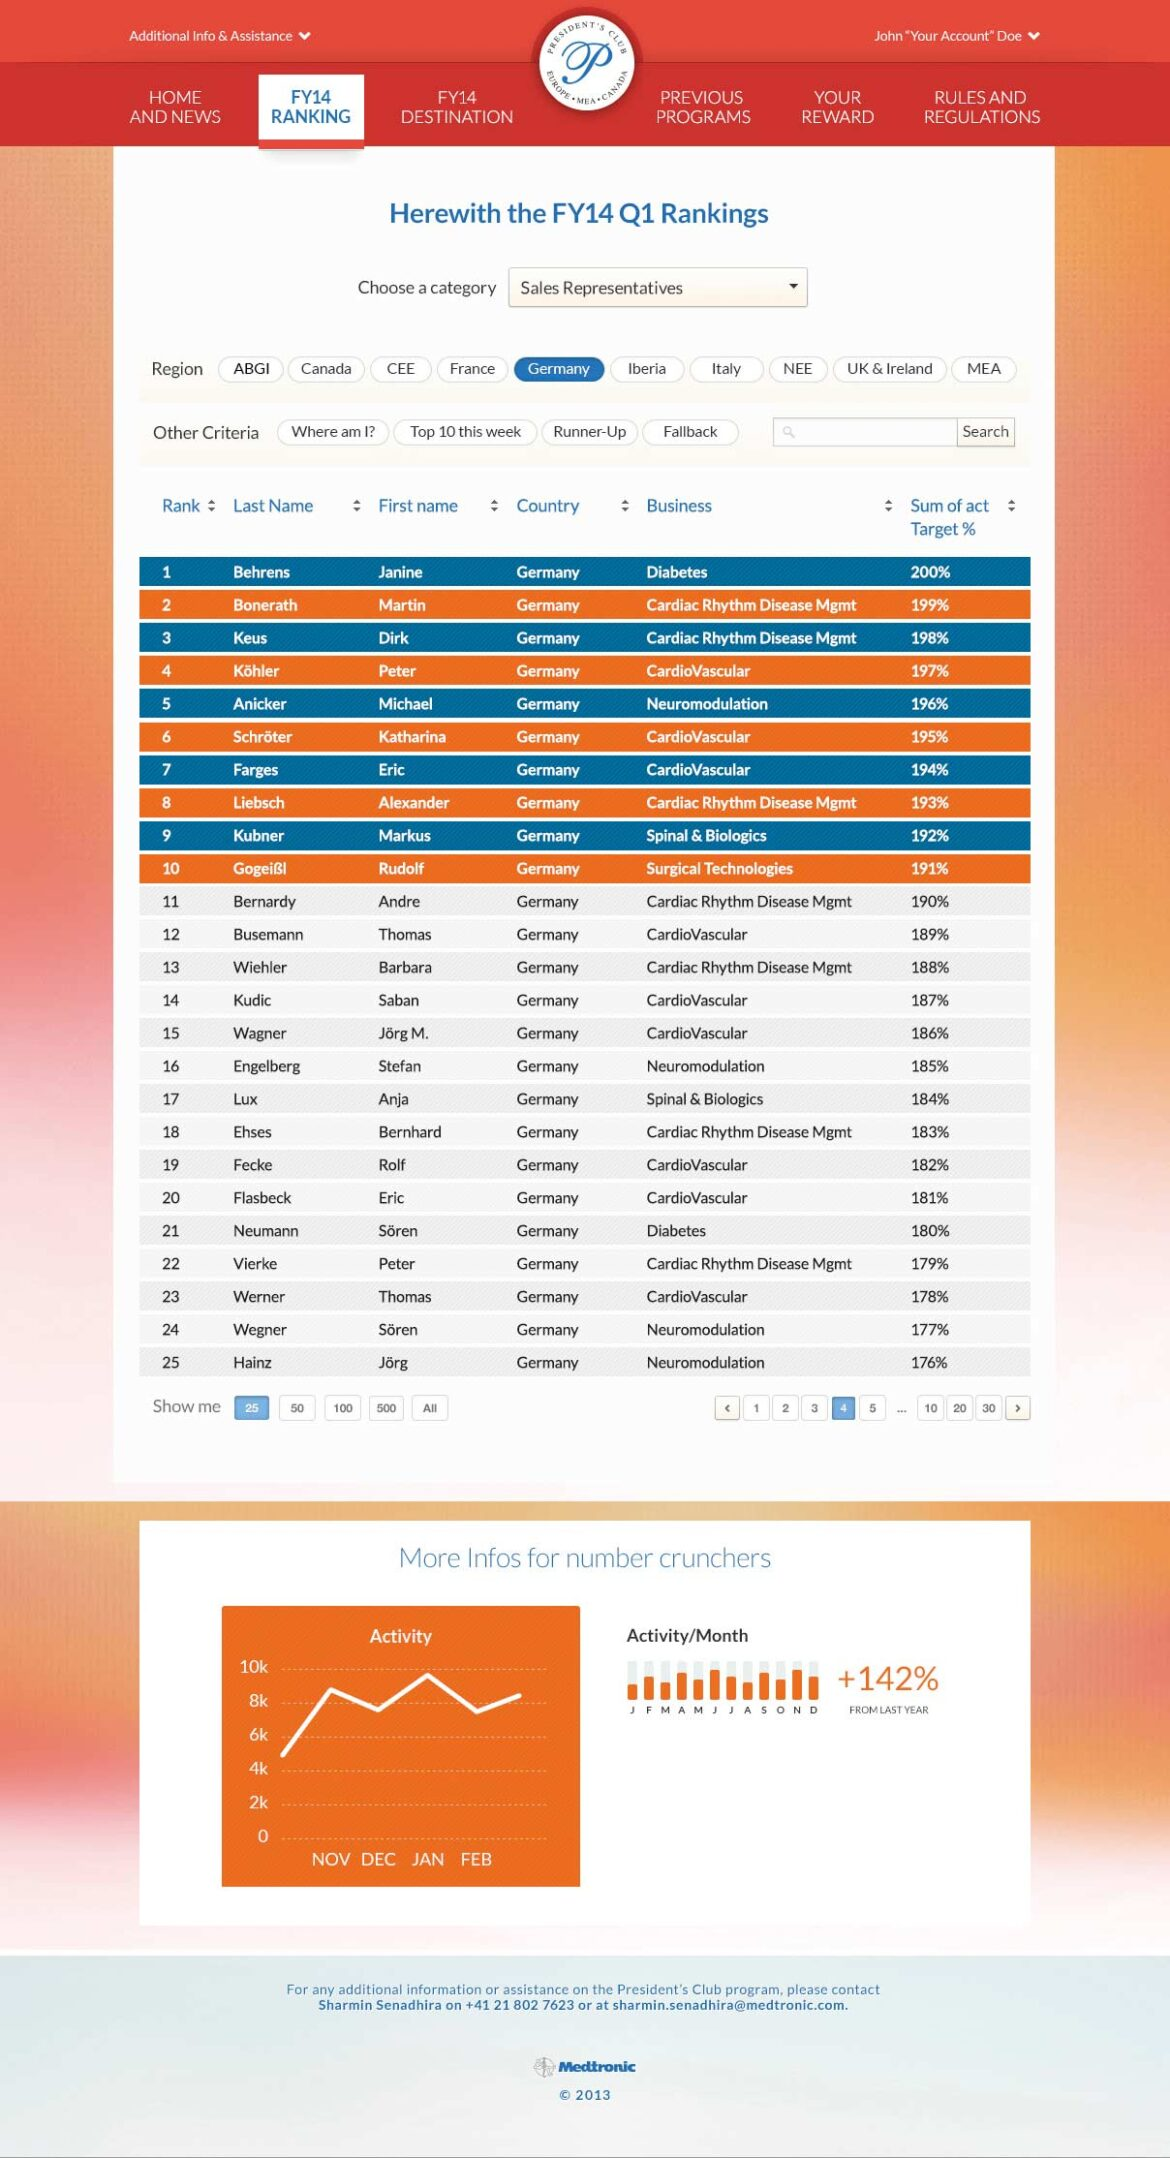 medtronic President's Club 2014 Rangliste